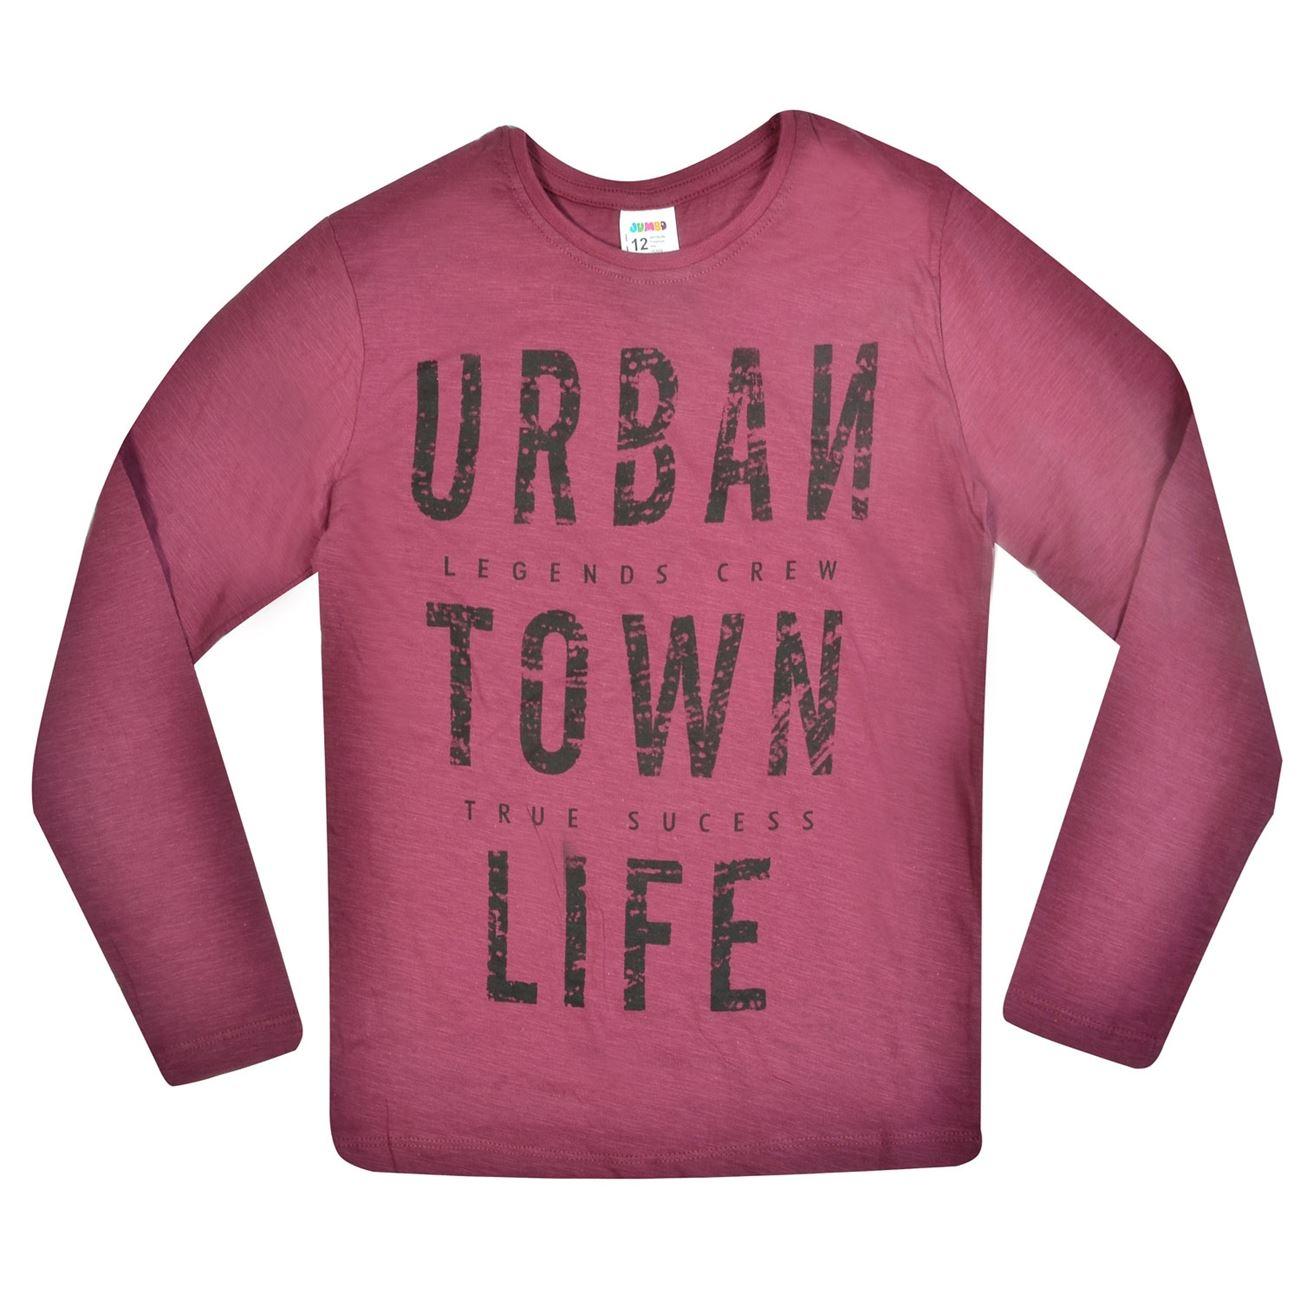 7fd88407b42 Μπλουζάκια Μακό για Αγόρια · Μπλούζα Μακρυμάνικη Παιδική Μπορντό Town Life